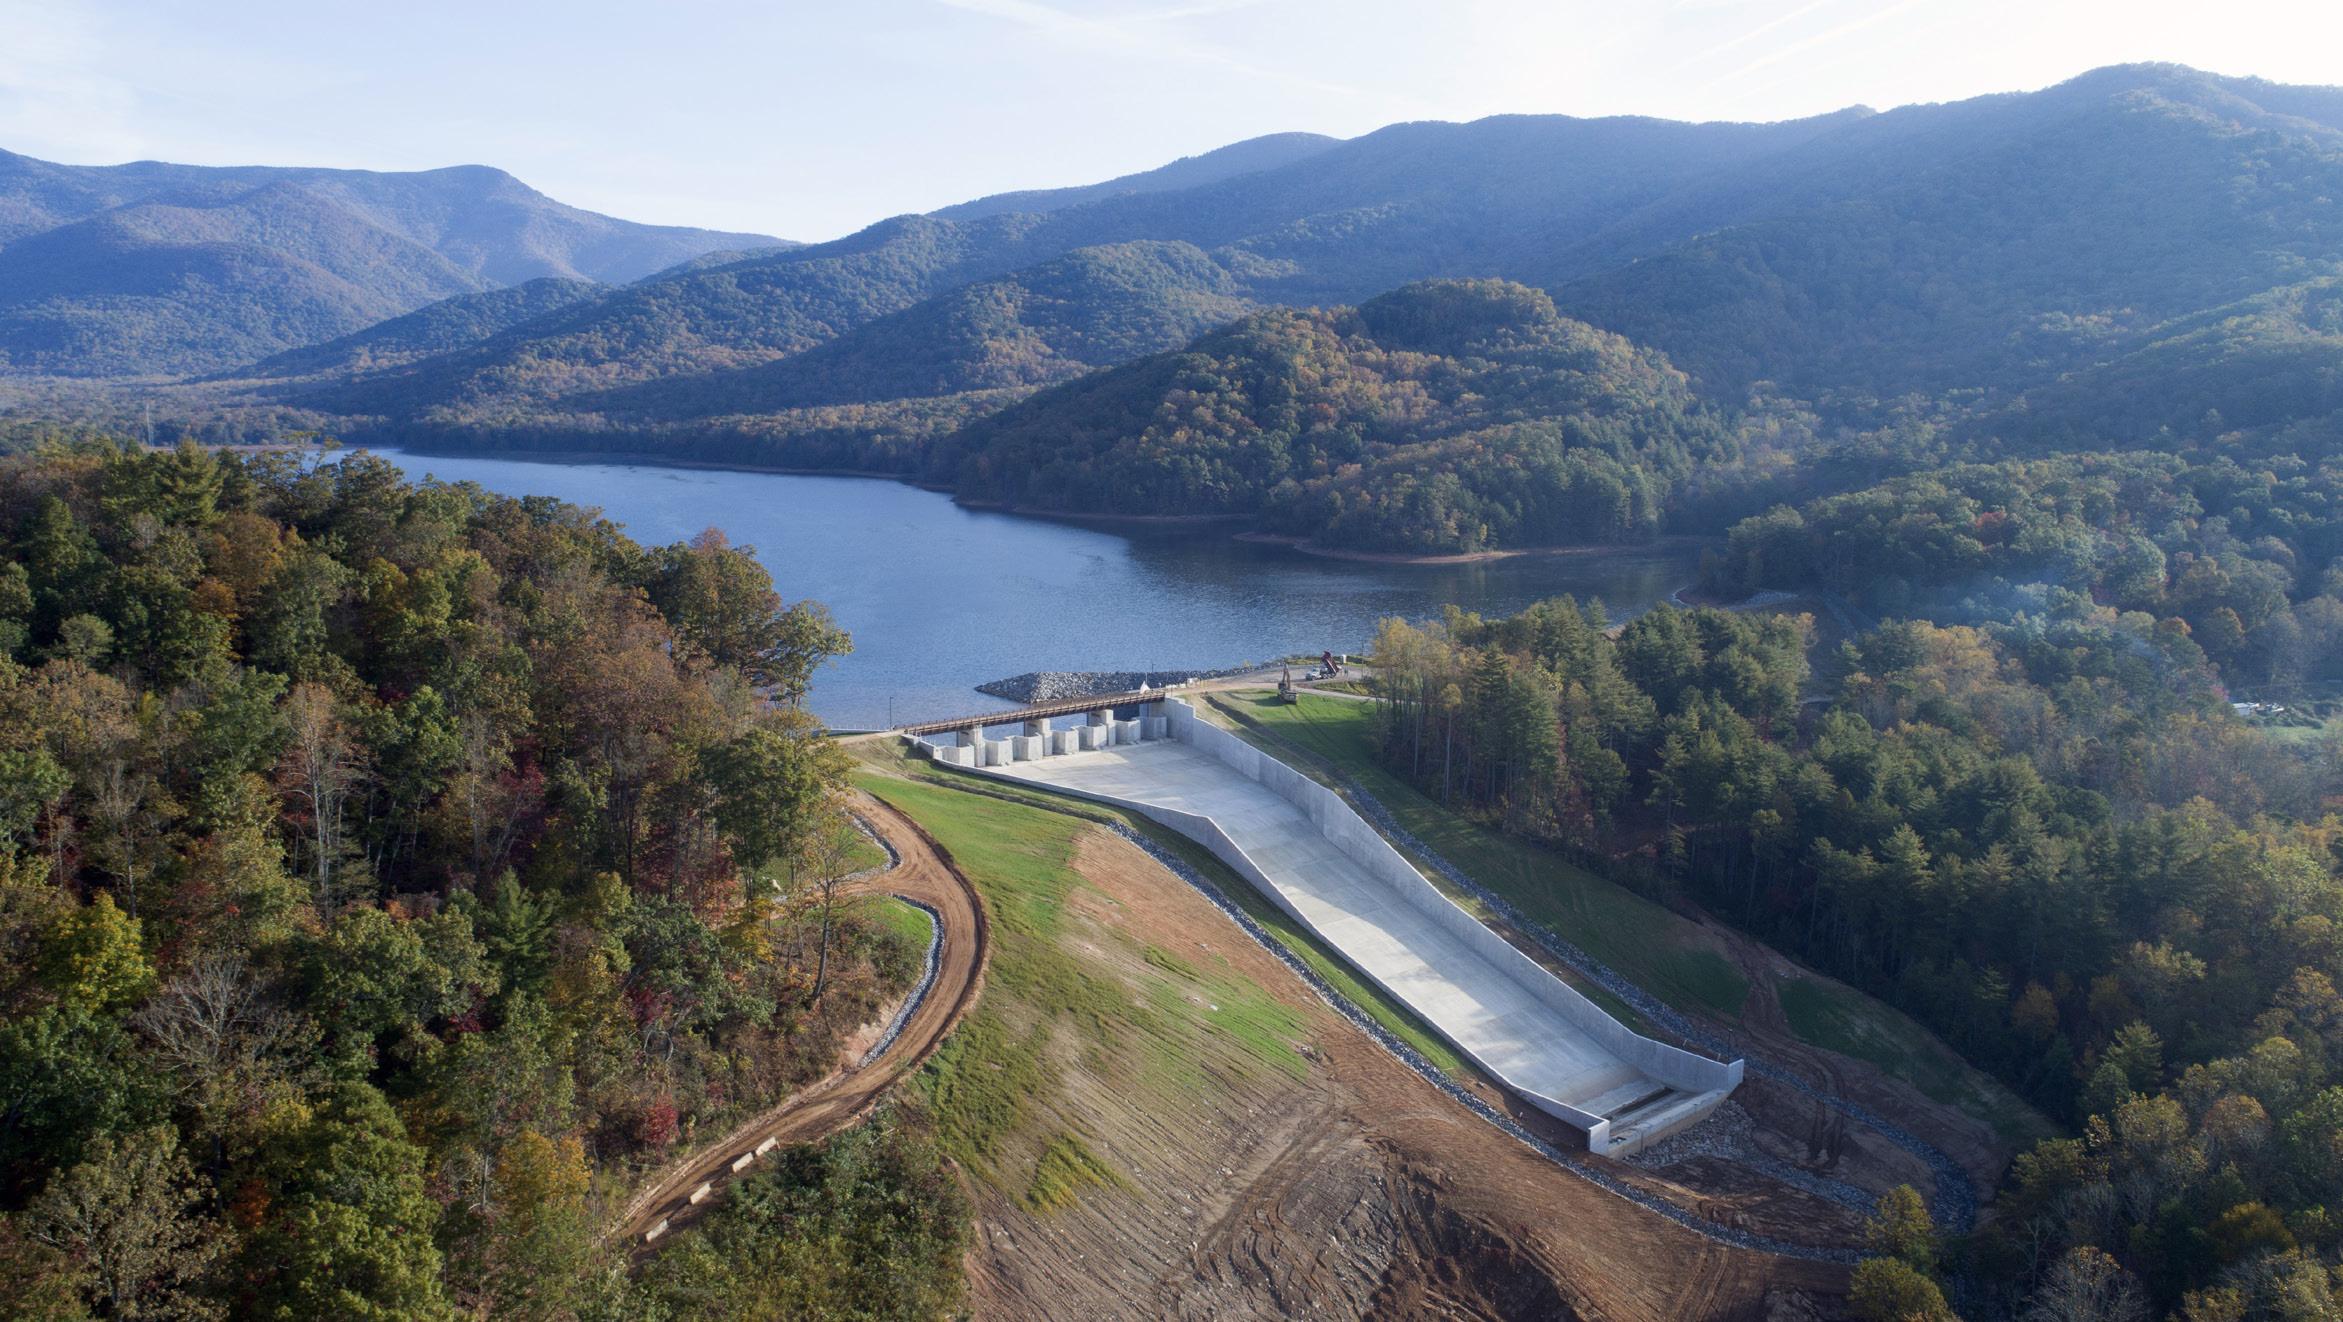 Congratulations to the 2021 Dam Safety Award Recipients!